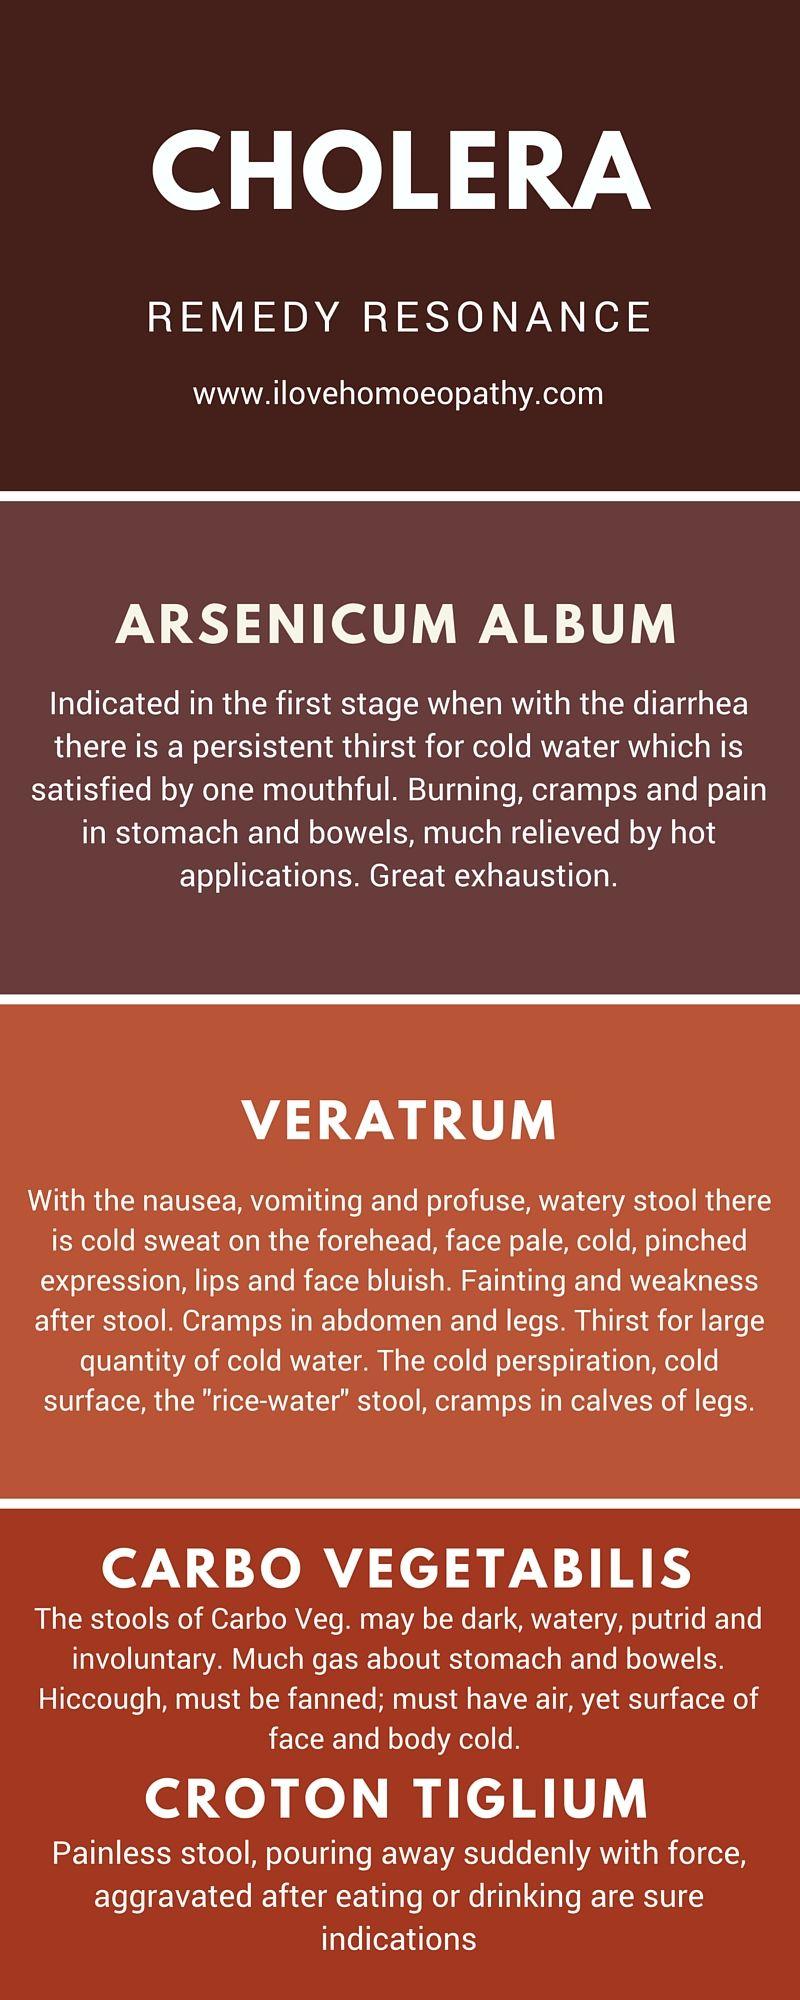 Cholera I Love Homeopathy